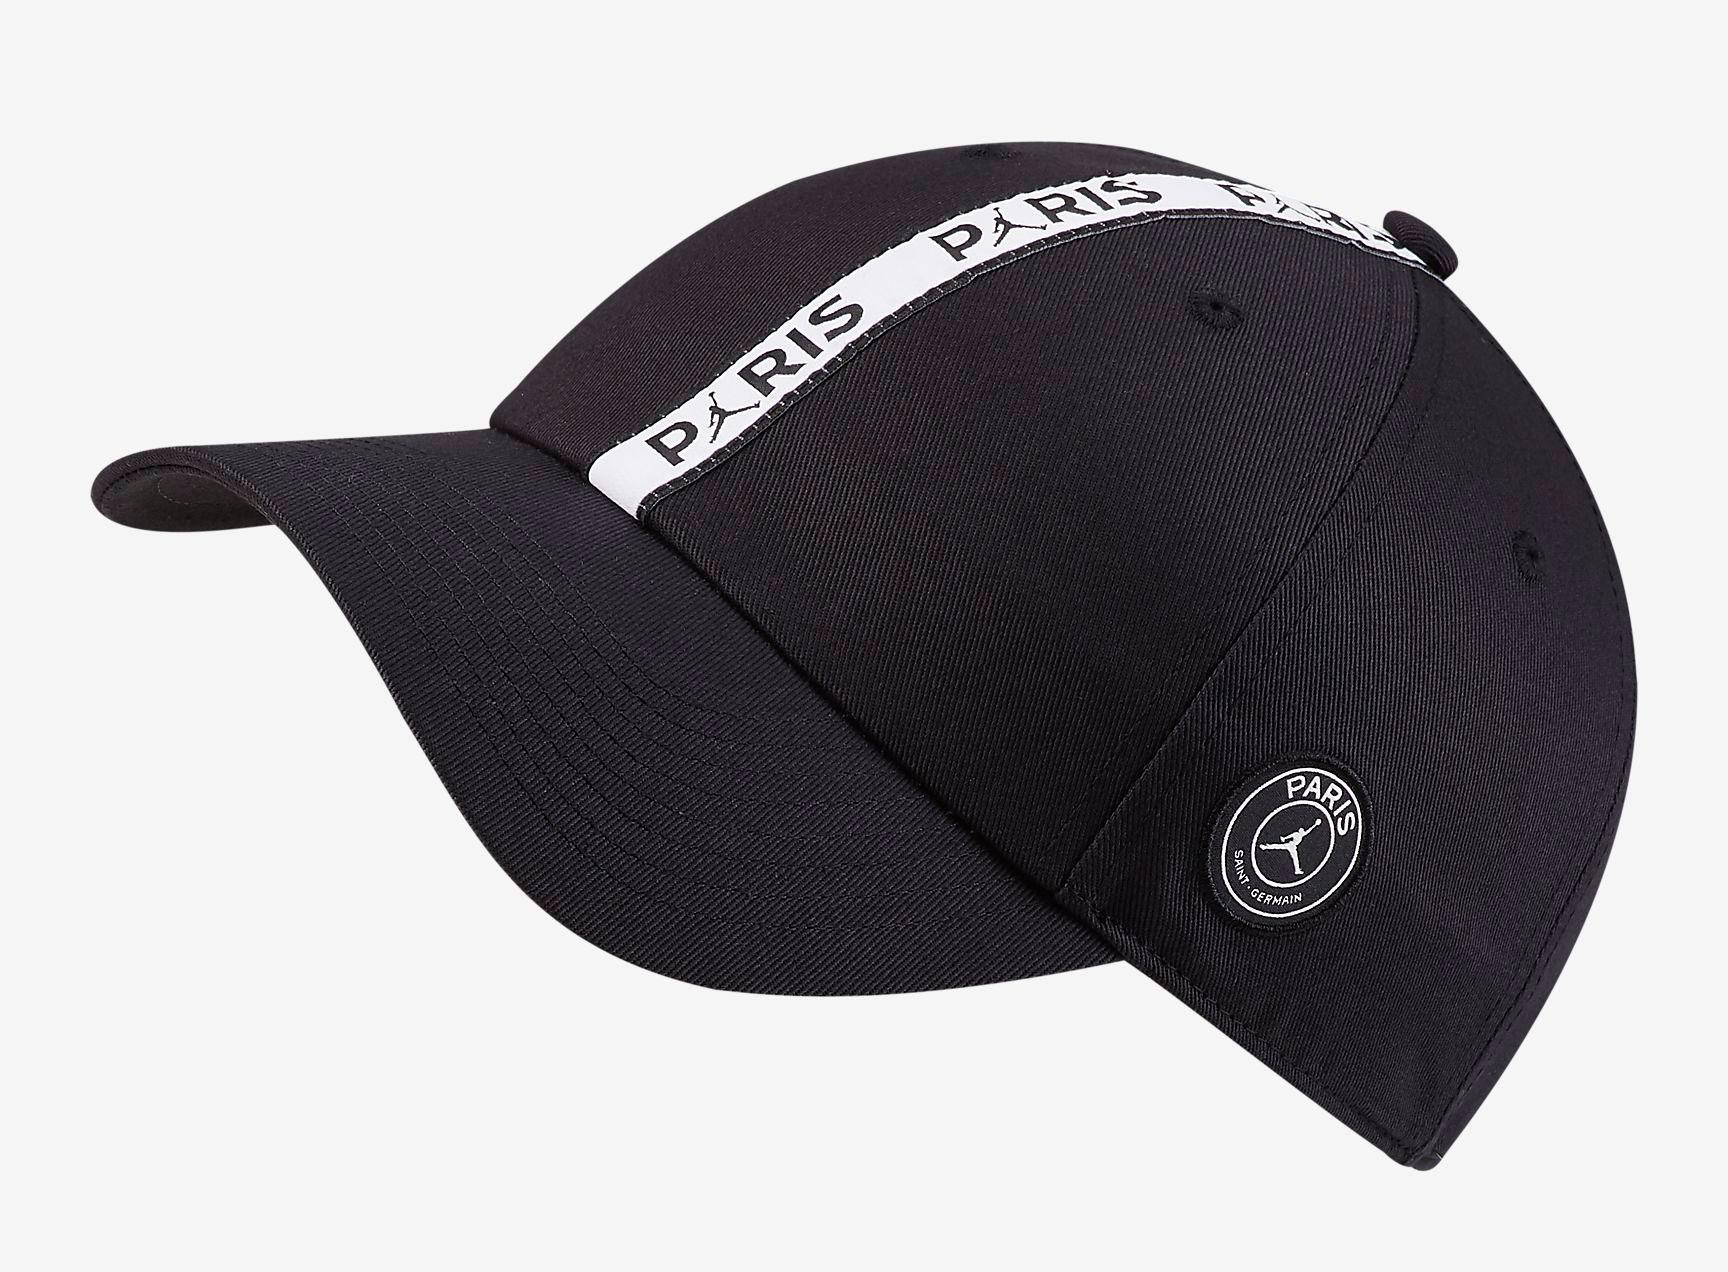 jordan-psg-paris-saint-germain-hat